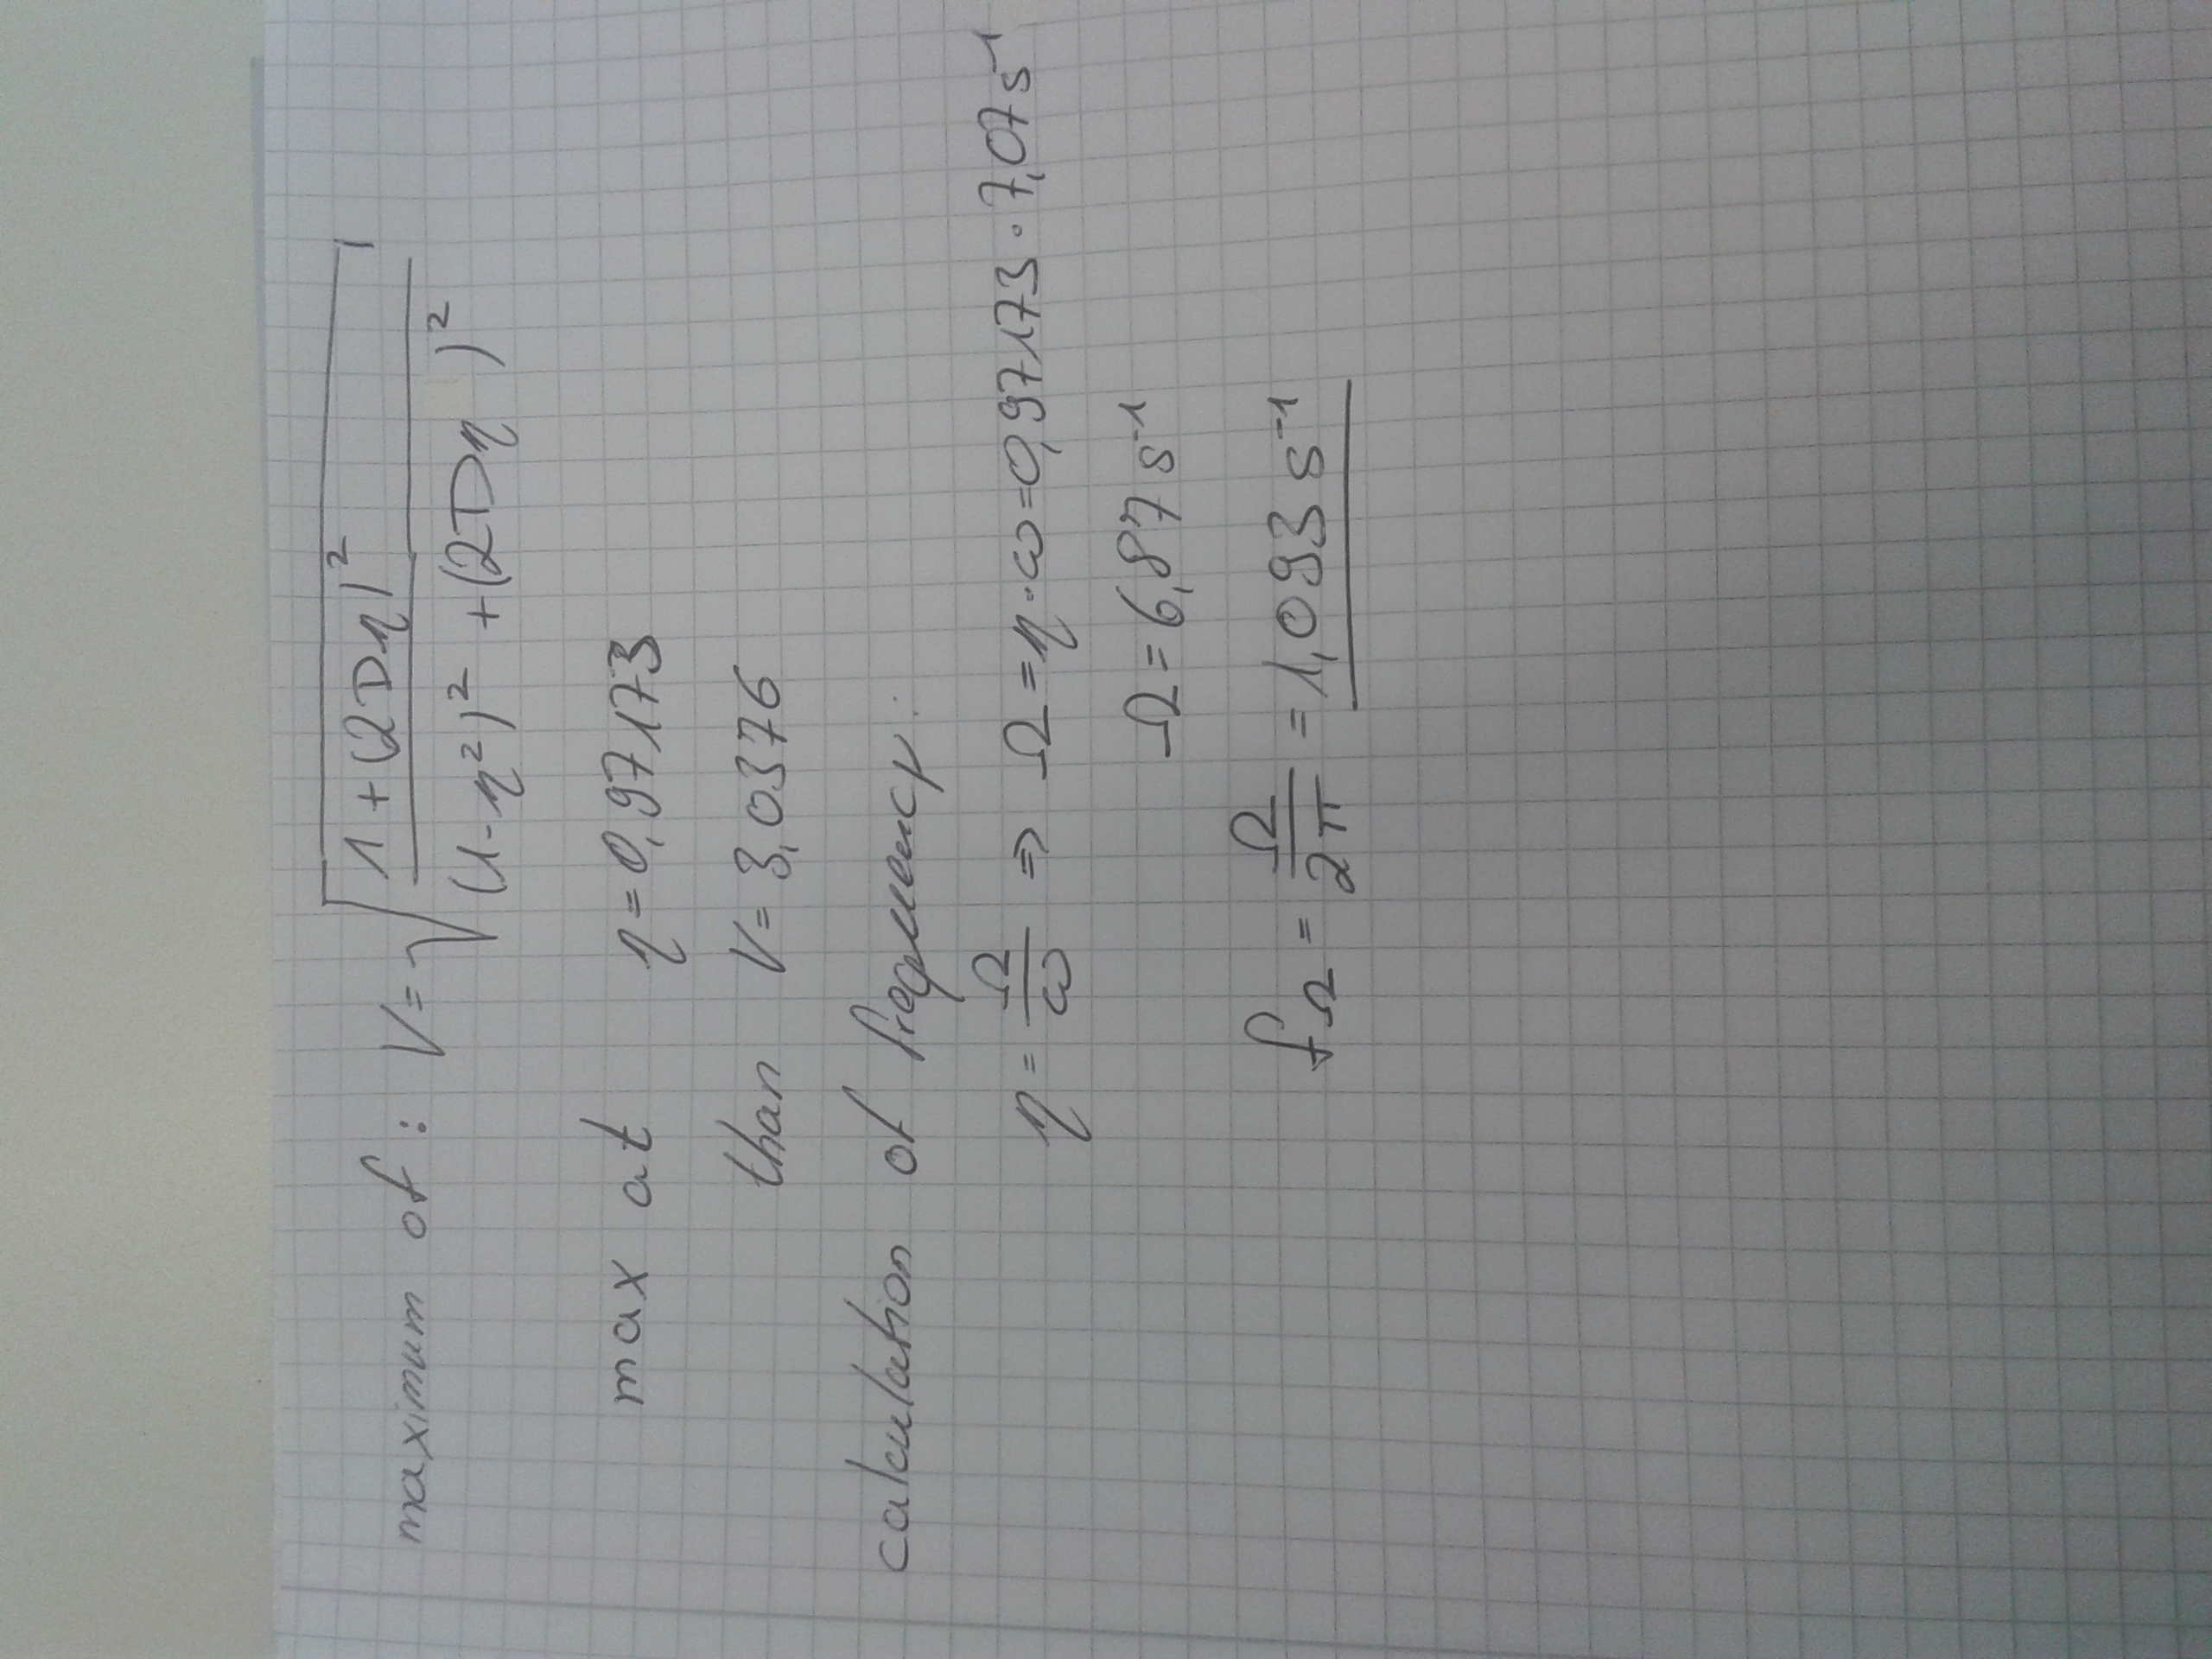 hc18g-20140423_100935.jpg